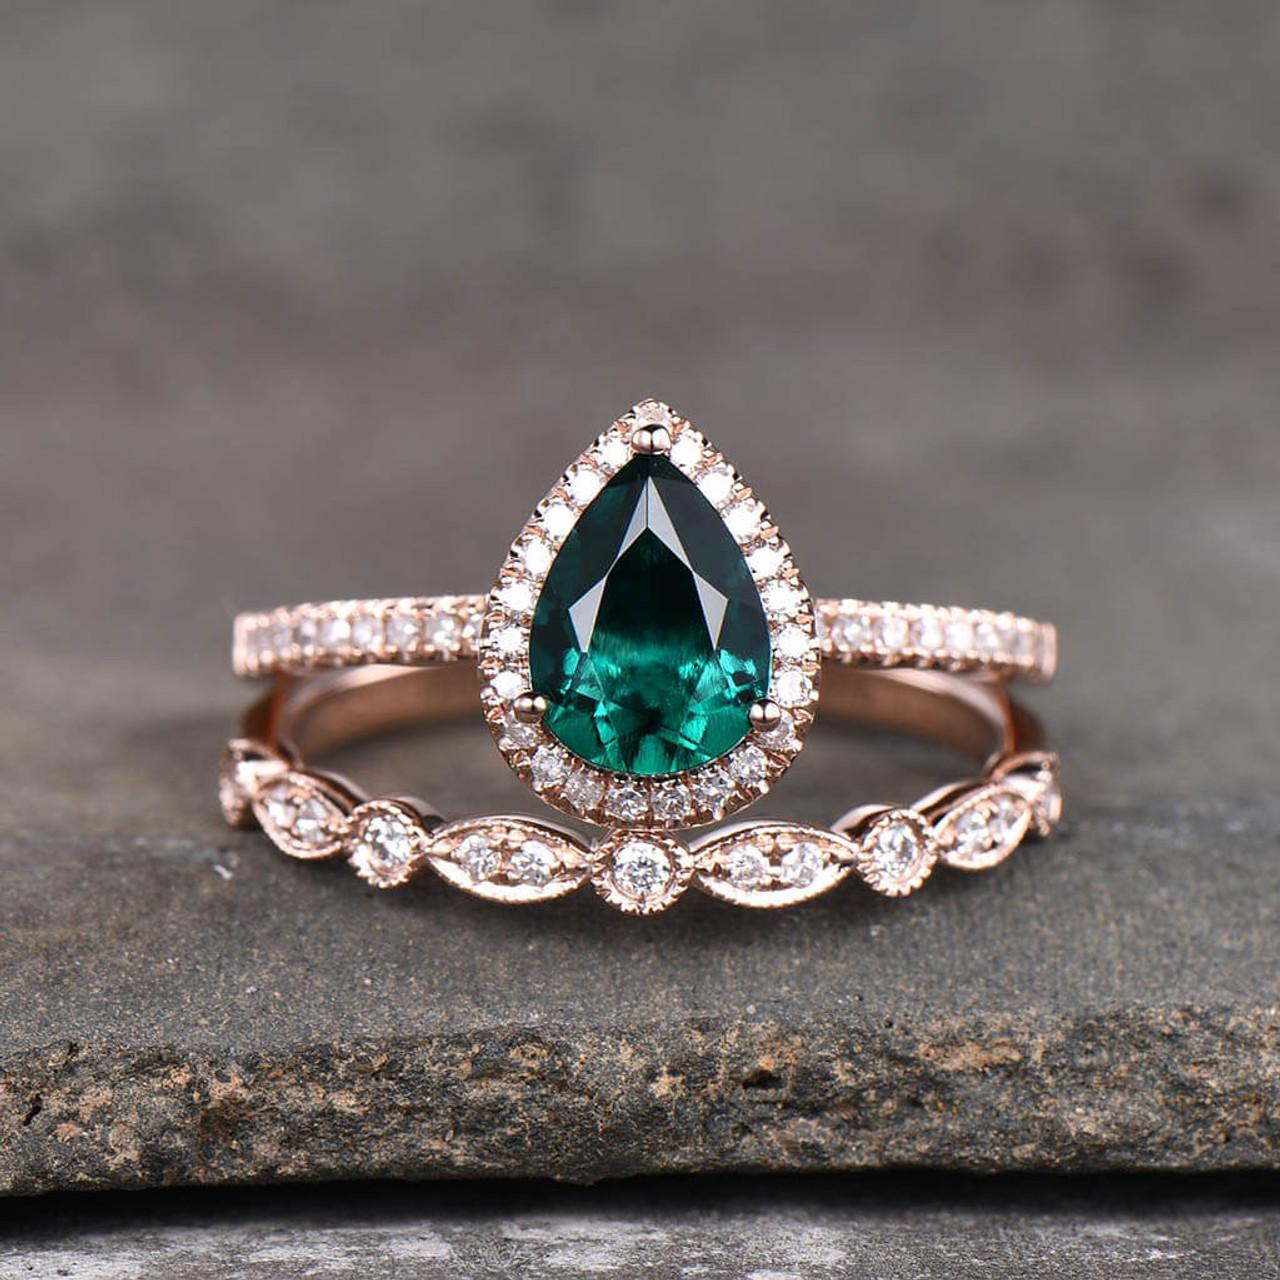 It is a graphic of 45 Carat Teardrop Emerald Engagement Ring Set Diamond Wedding Band 454k Yellow Gold Art Deco Milgrain Stacking